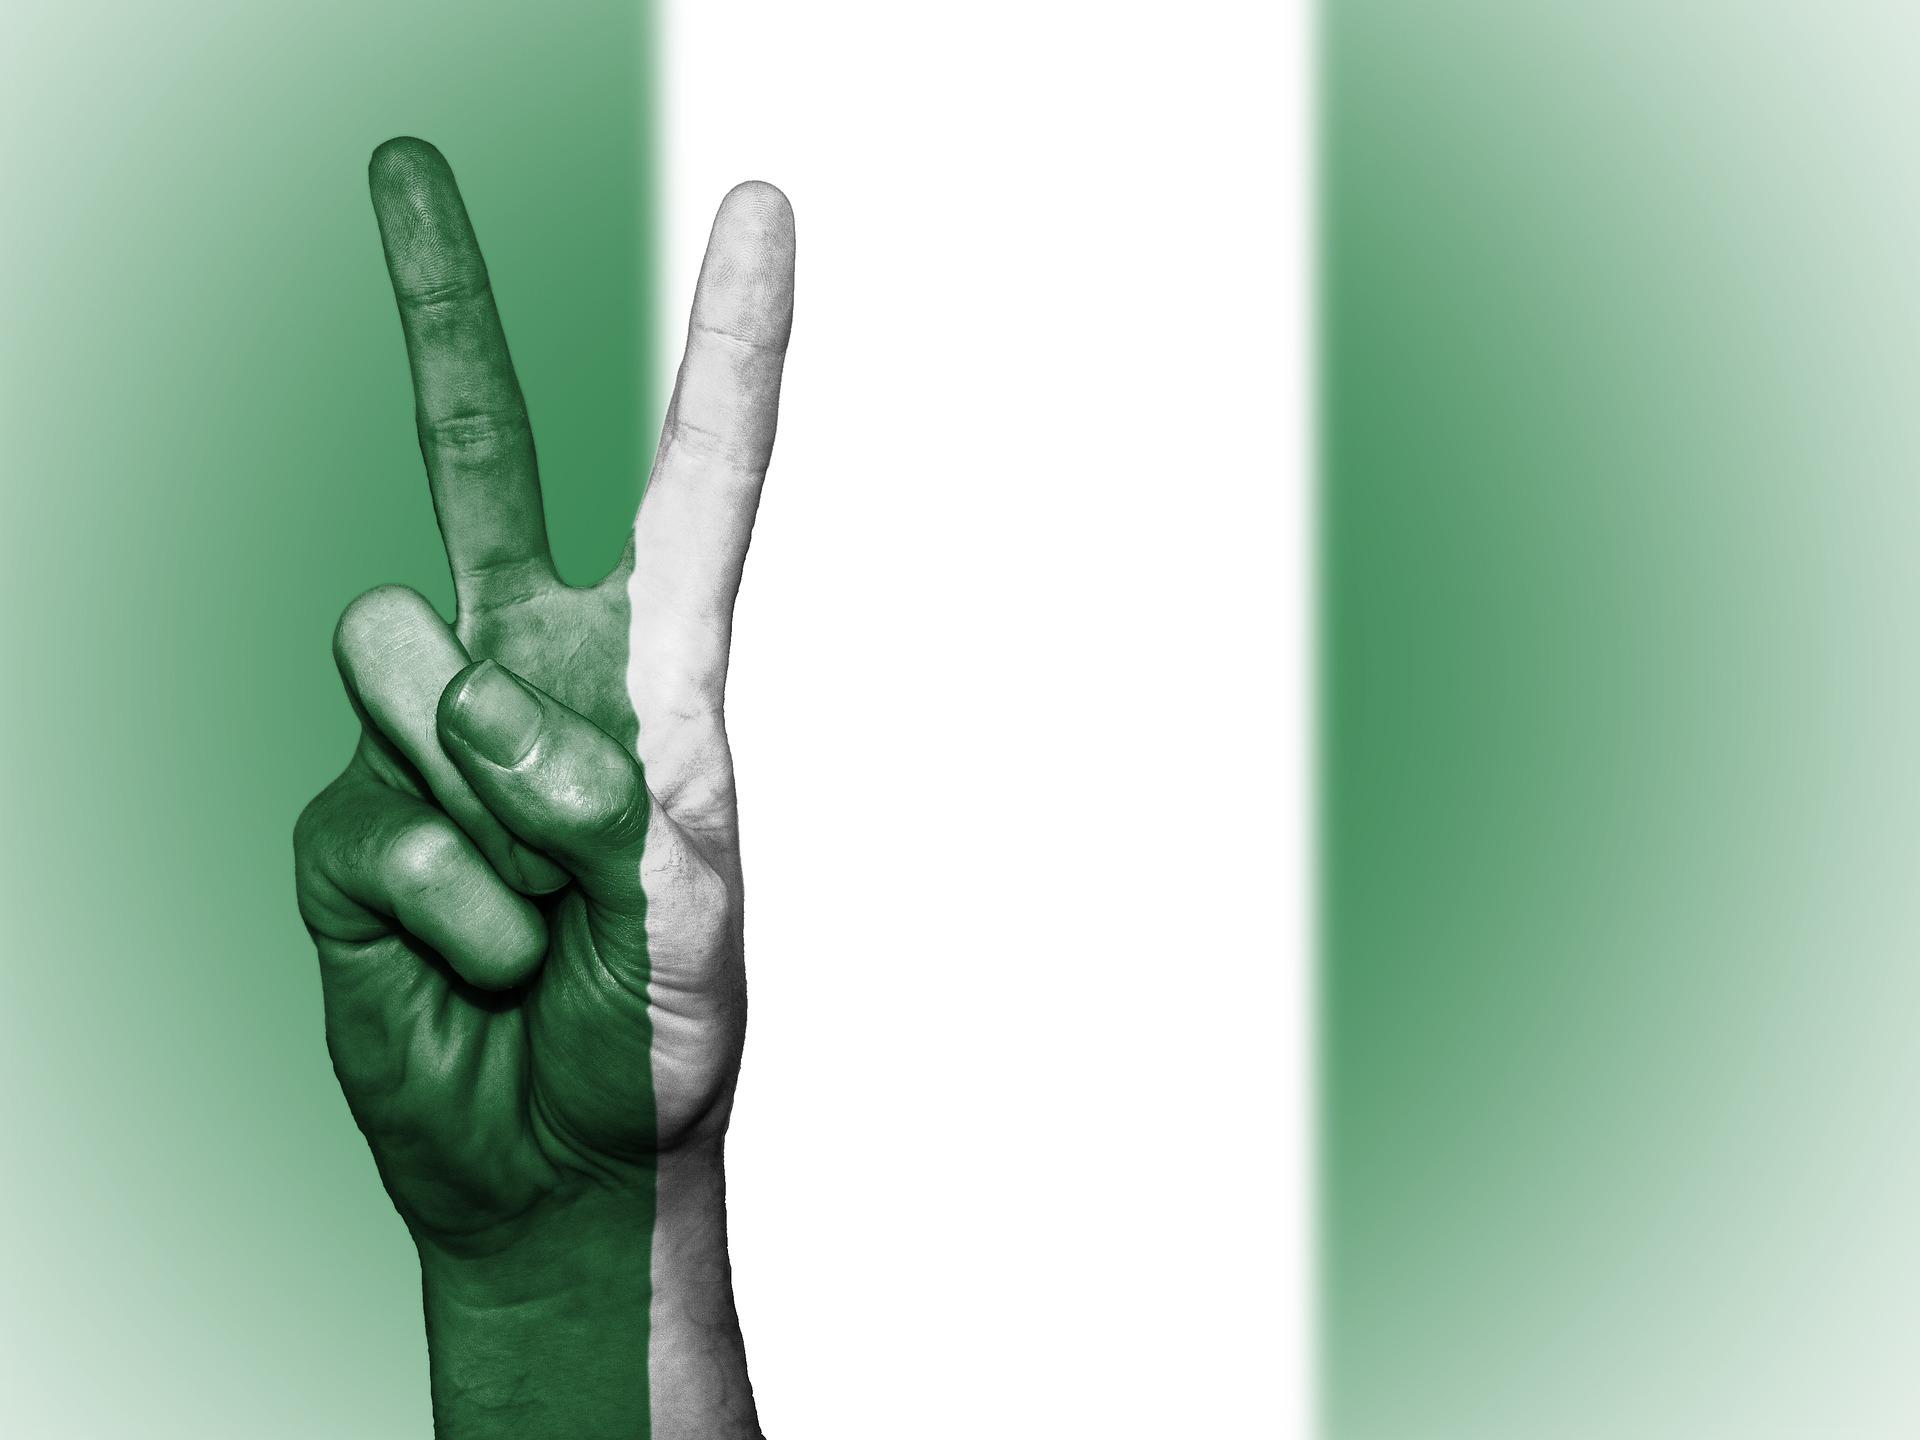 Call Nigeria: cheap international calls